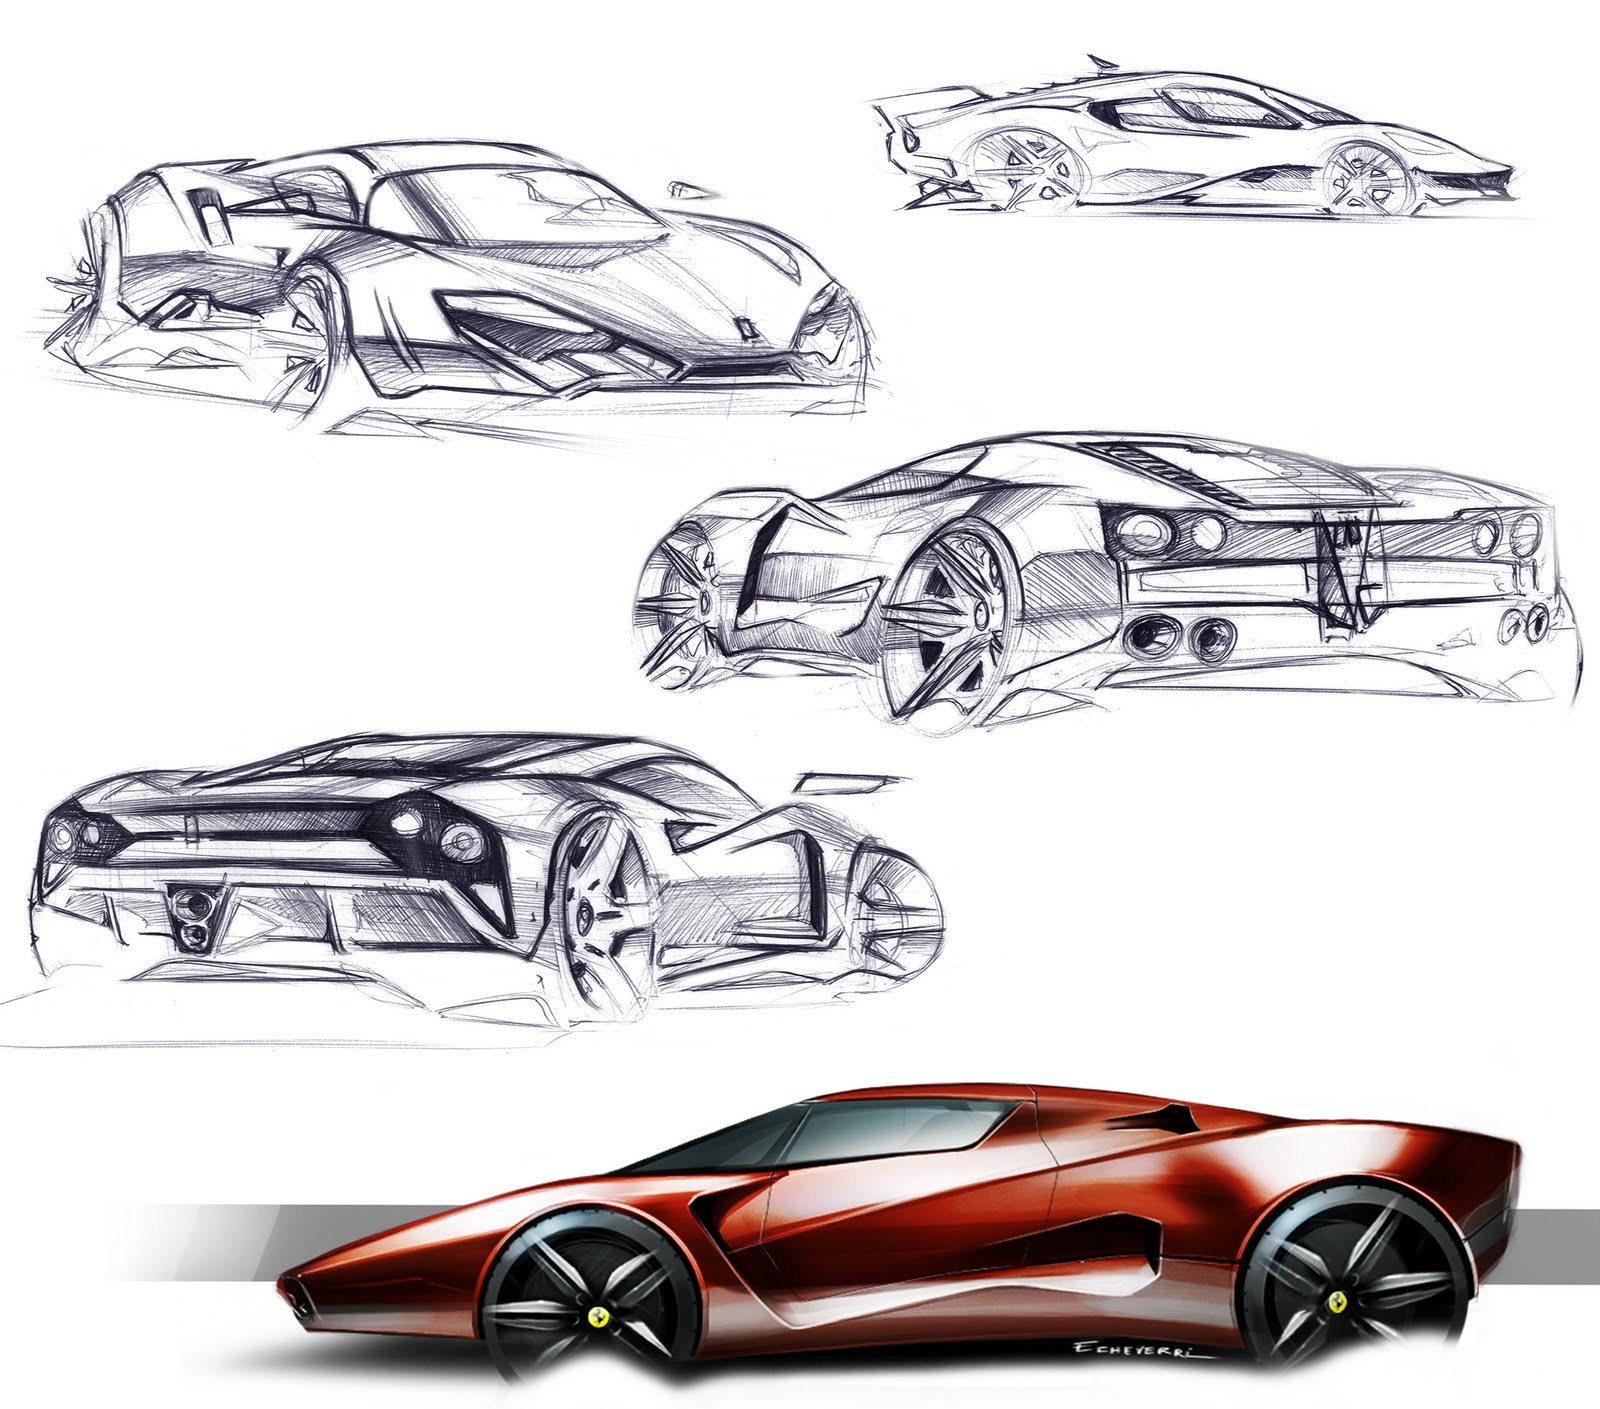 Ferrari J50 Design Sketches - Car Body Design |Ferrari Design Sketches